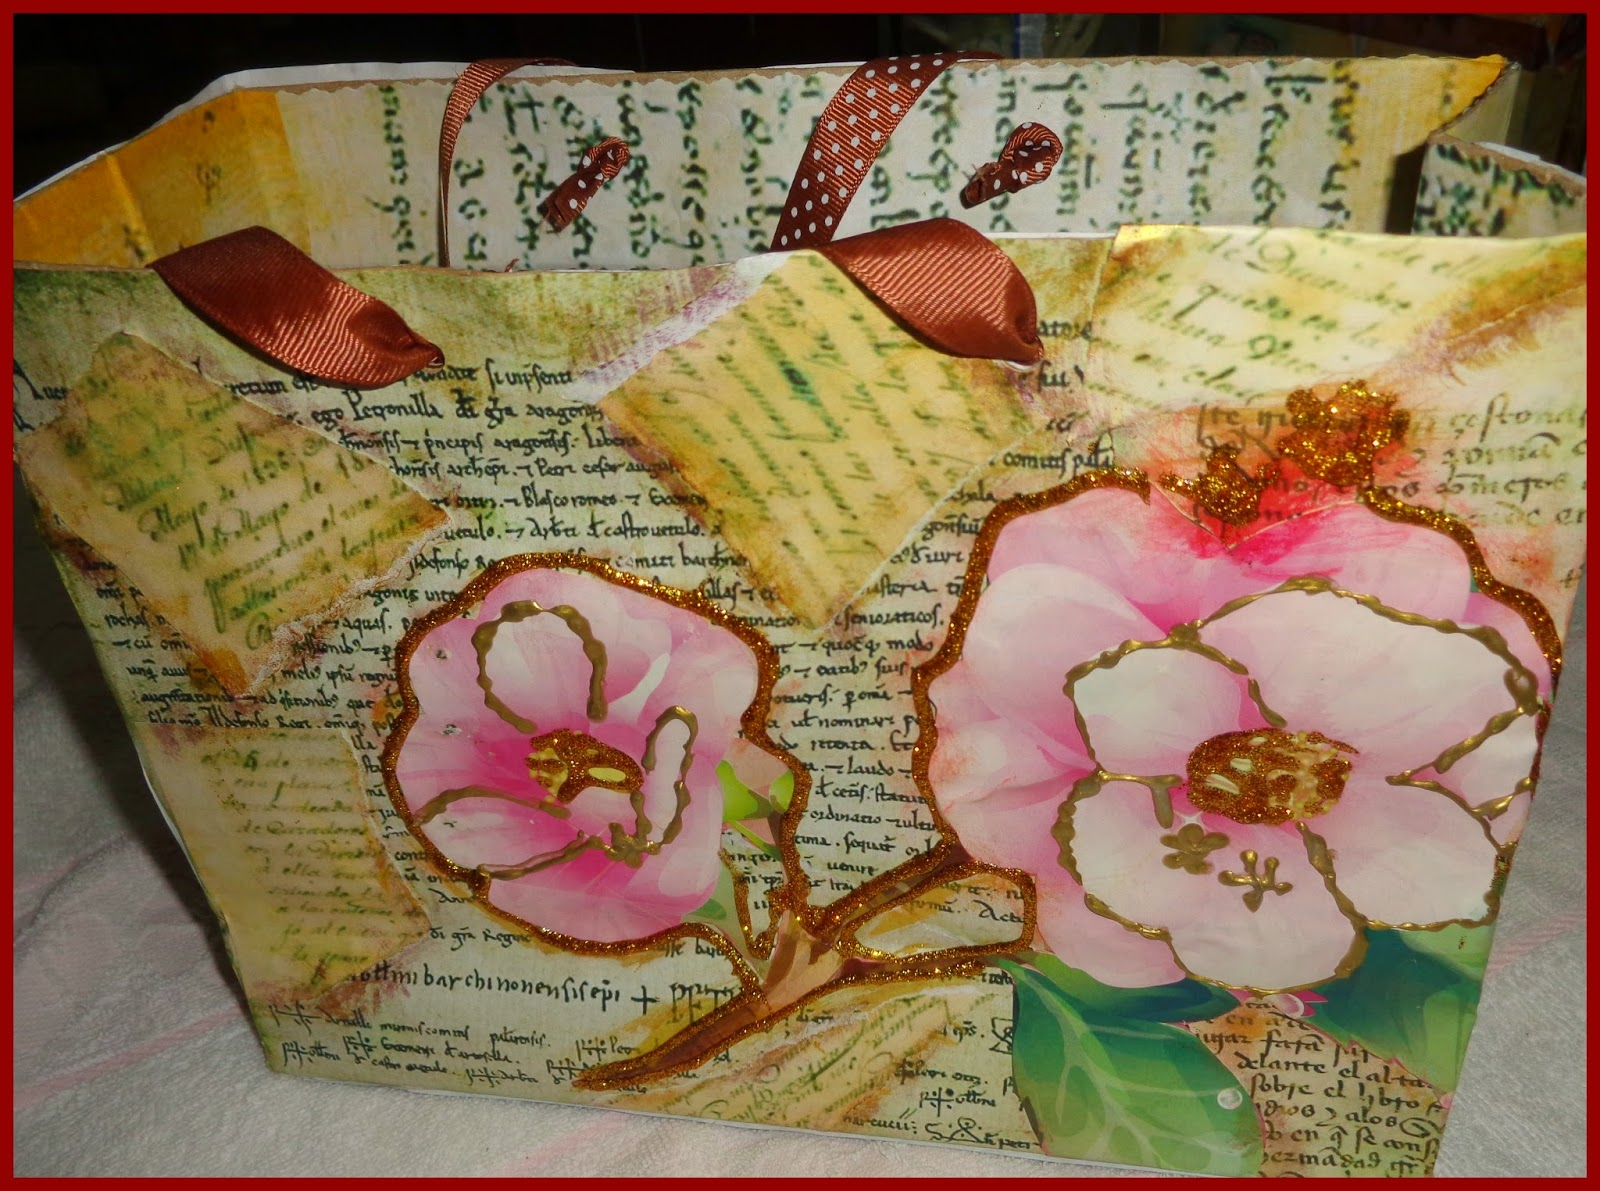 Manualidades el colibri paso a paso para decorar bolsas - Bolsas para decorar ...